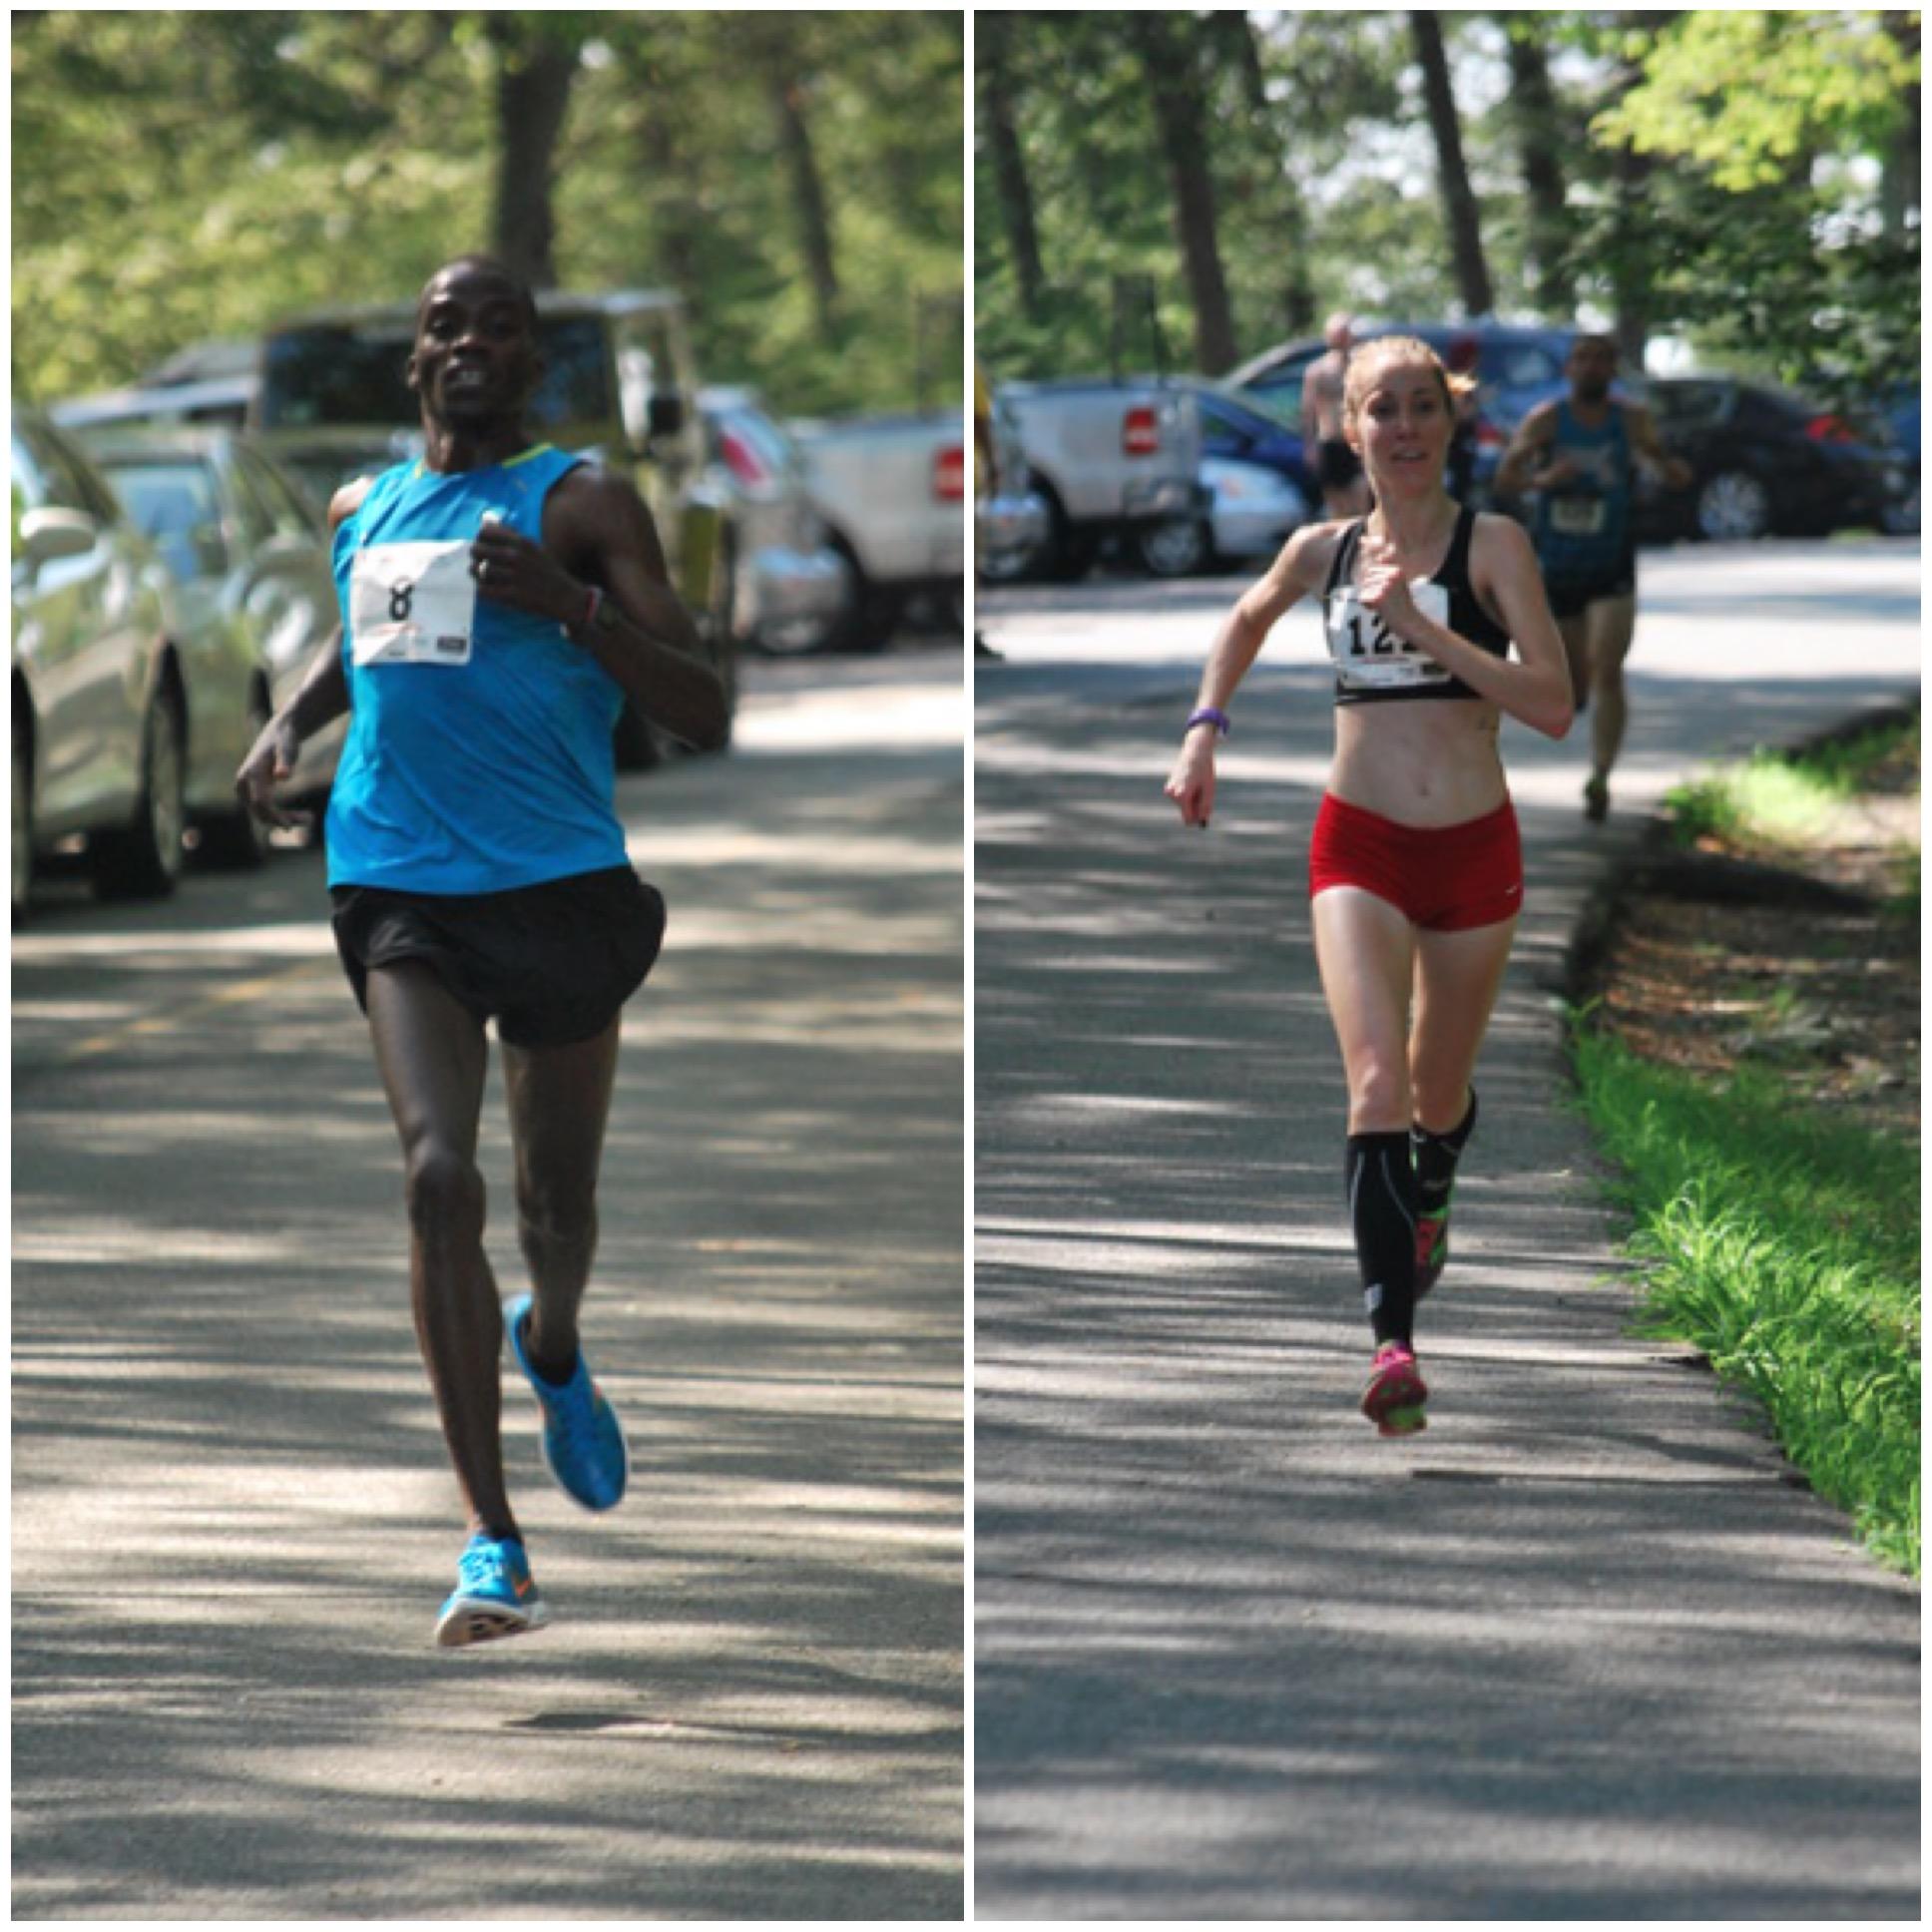 2015 race winners Glarius Rop and Rosa Moriello. Photos courtesy of Krissy Kozlosky.